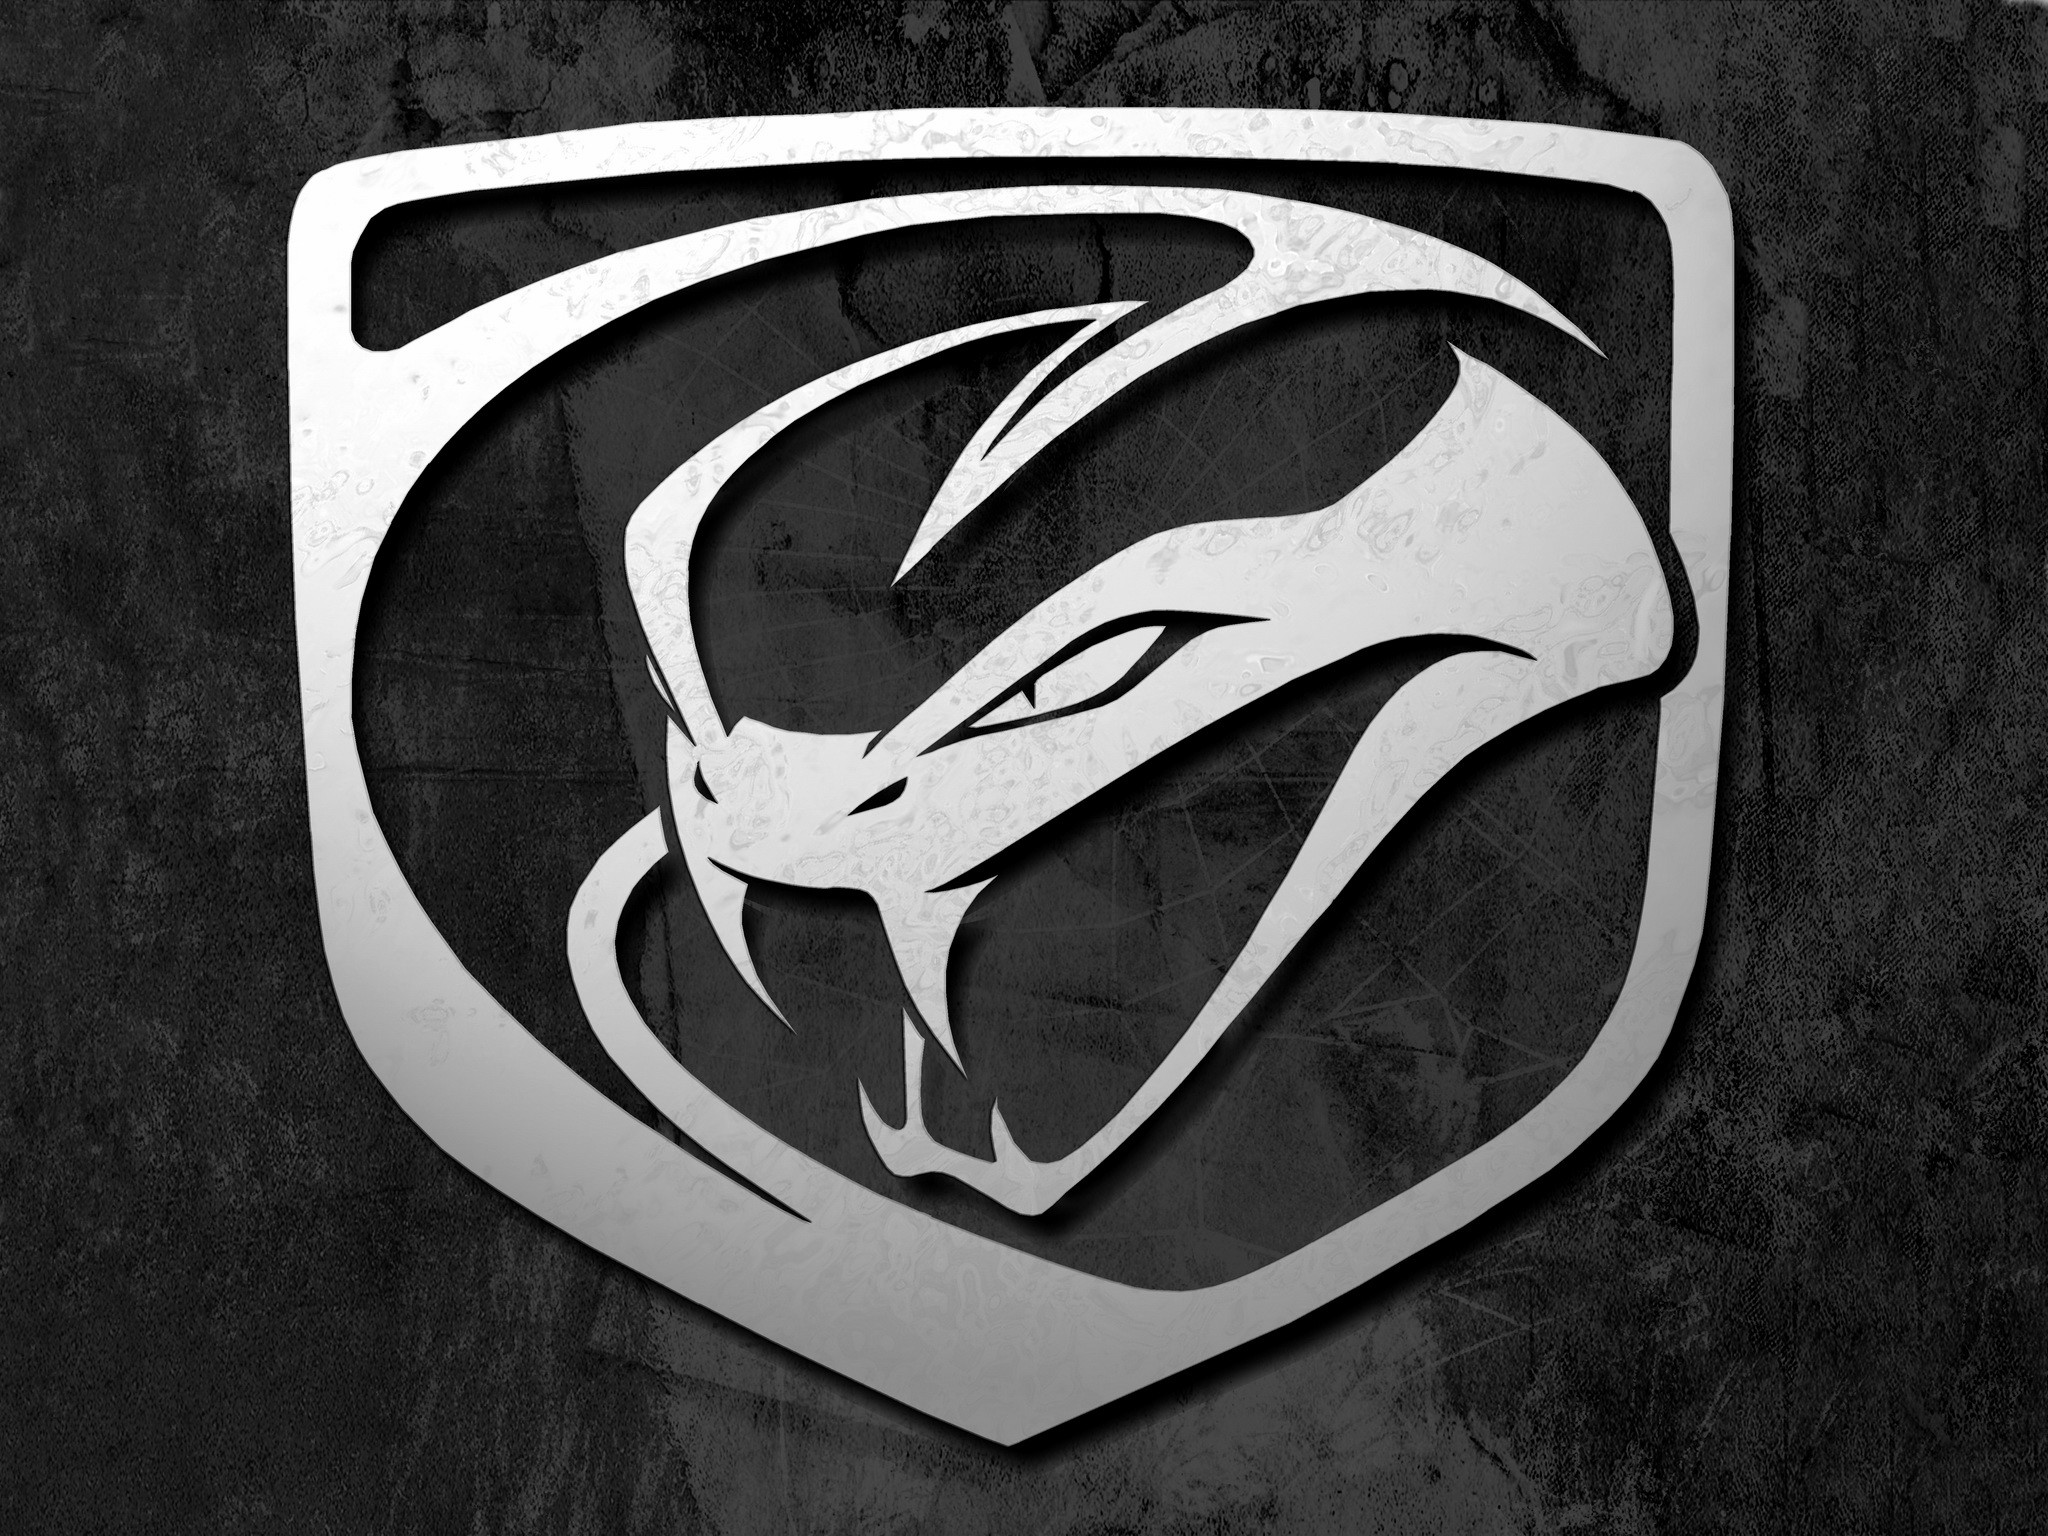 2048x1536 Dodge Viper Logo Stryker